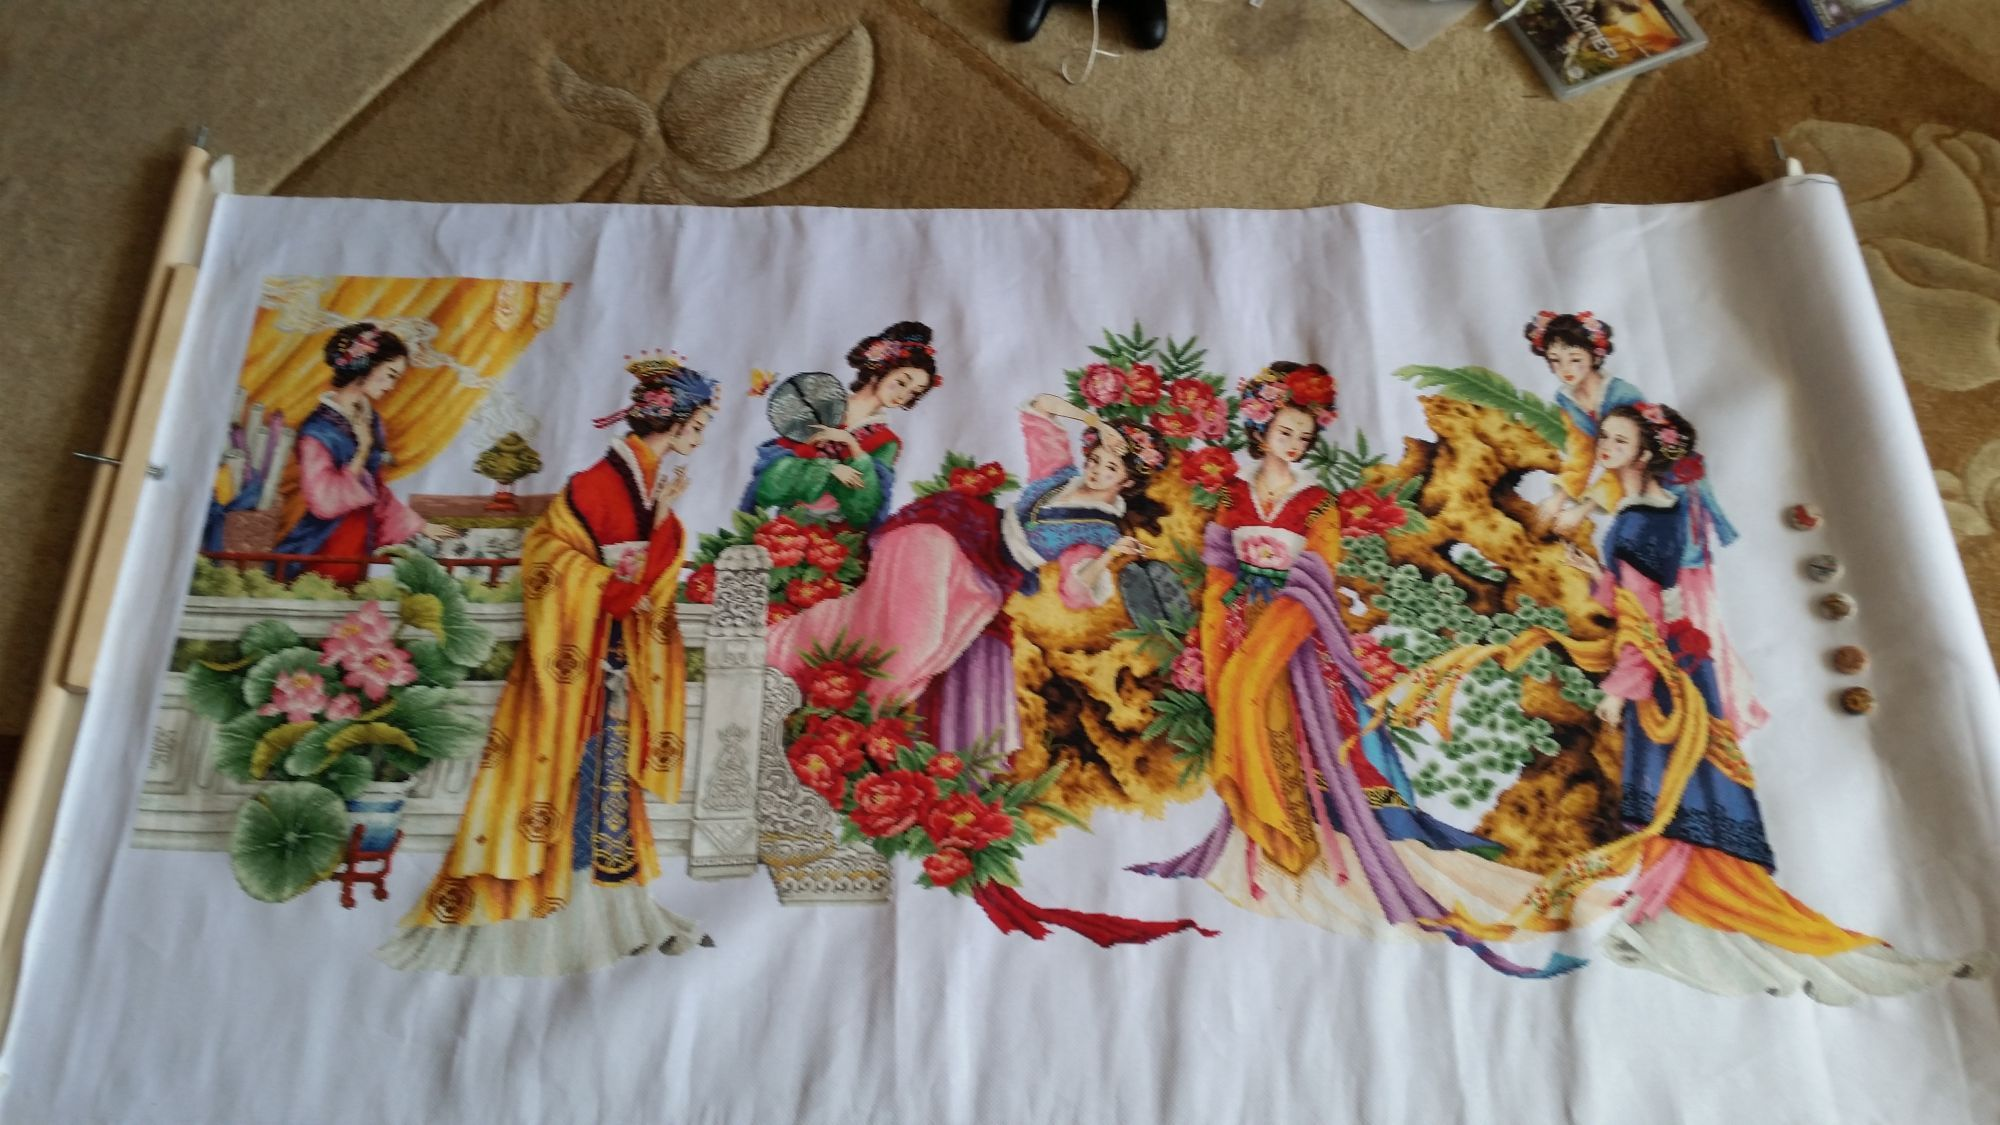 Вышивка крестом 12 красавиц японок готовая работа 63